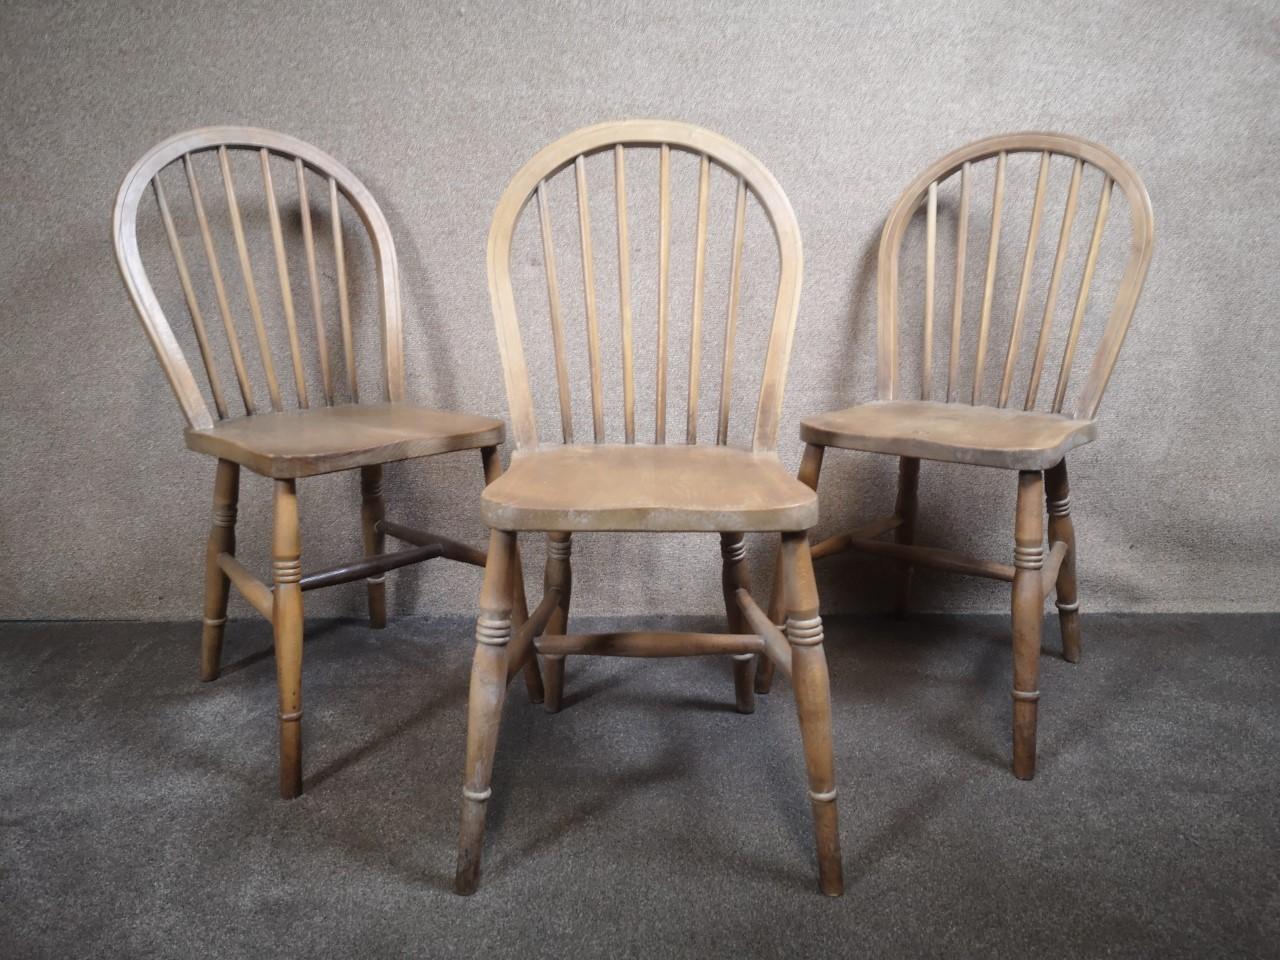 3 Windsor chairs画像